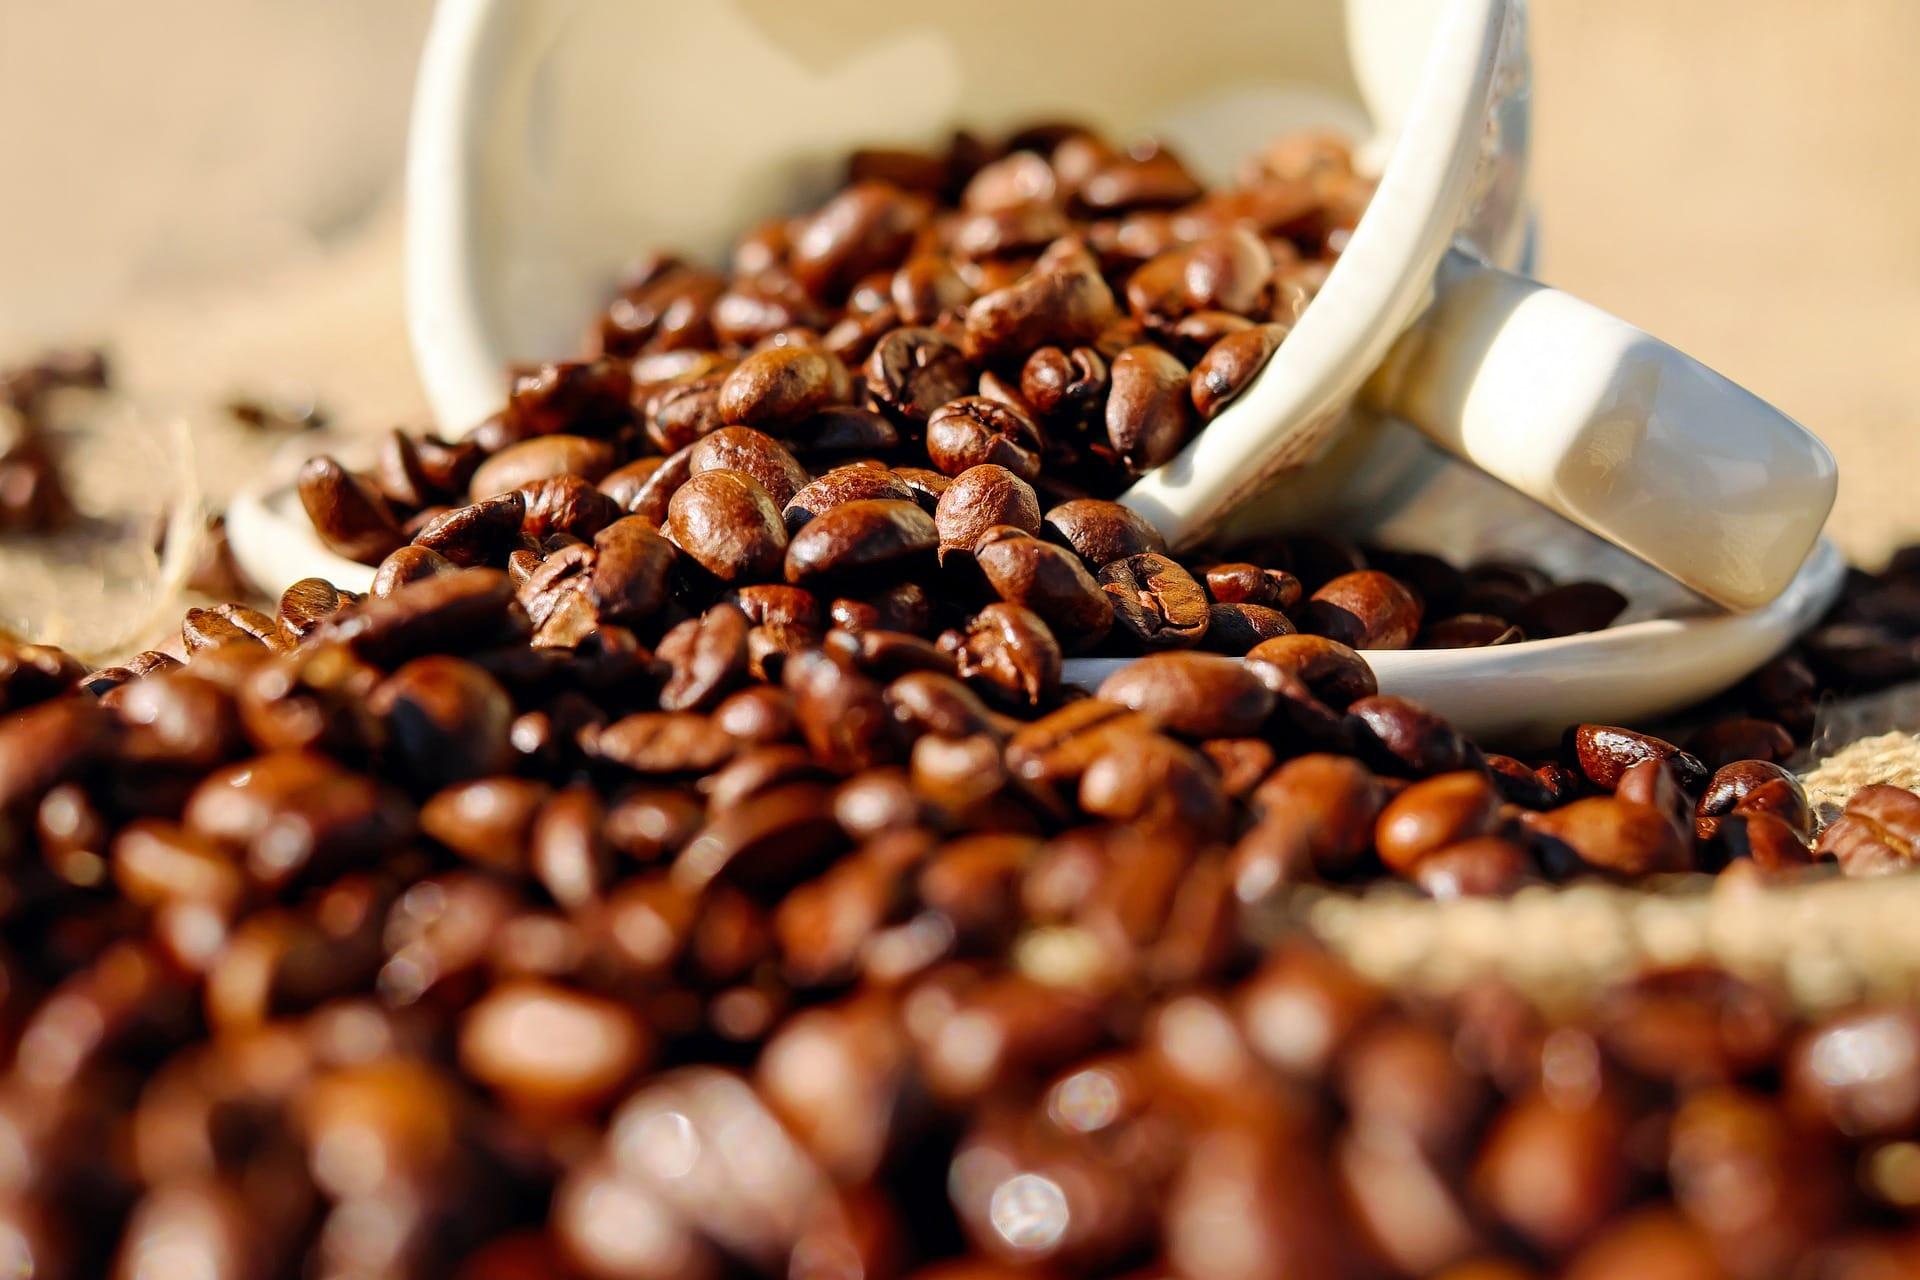 antioxidant caffeine mug coffee beans skin care beauty products